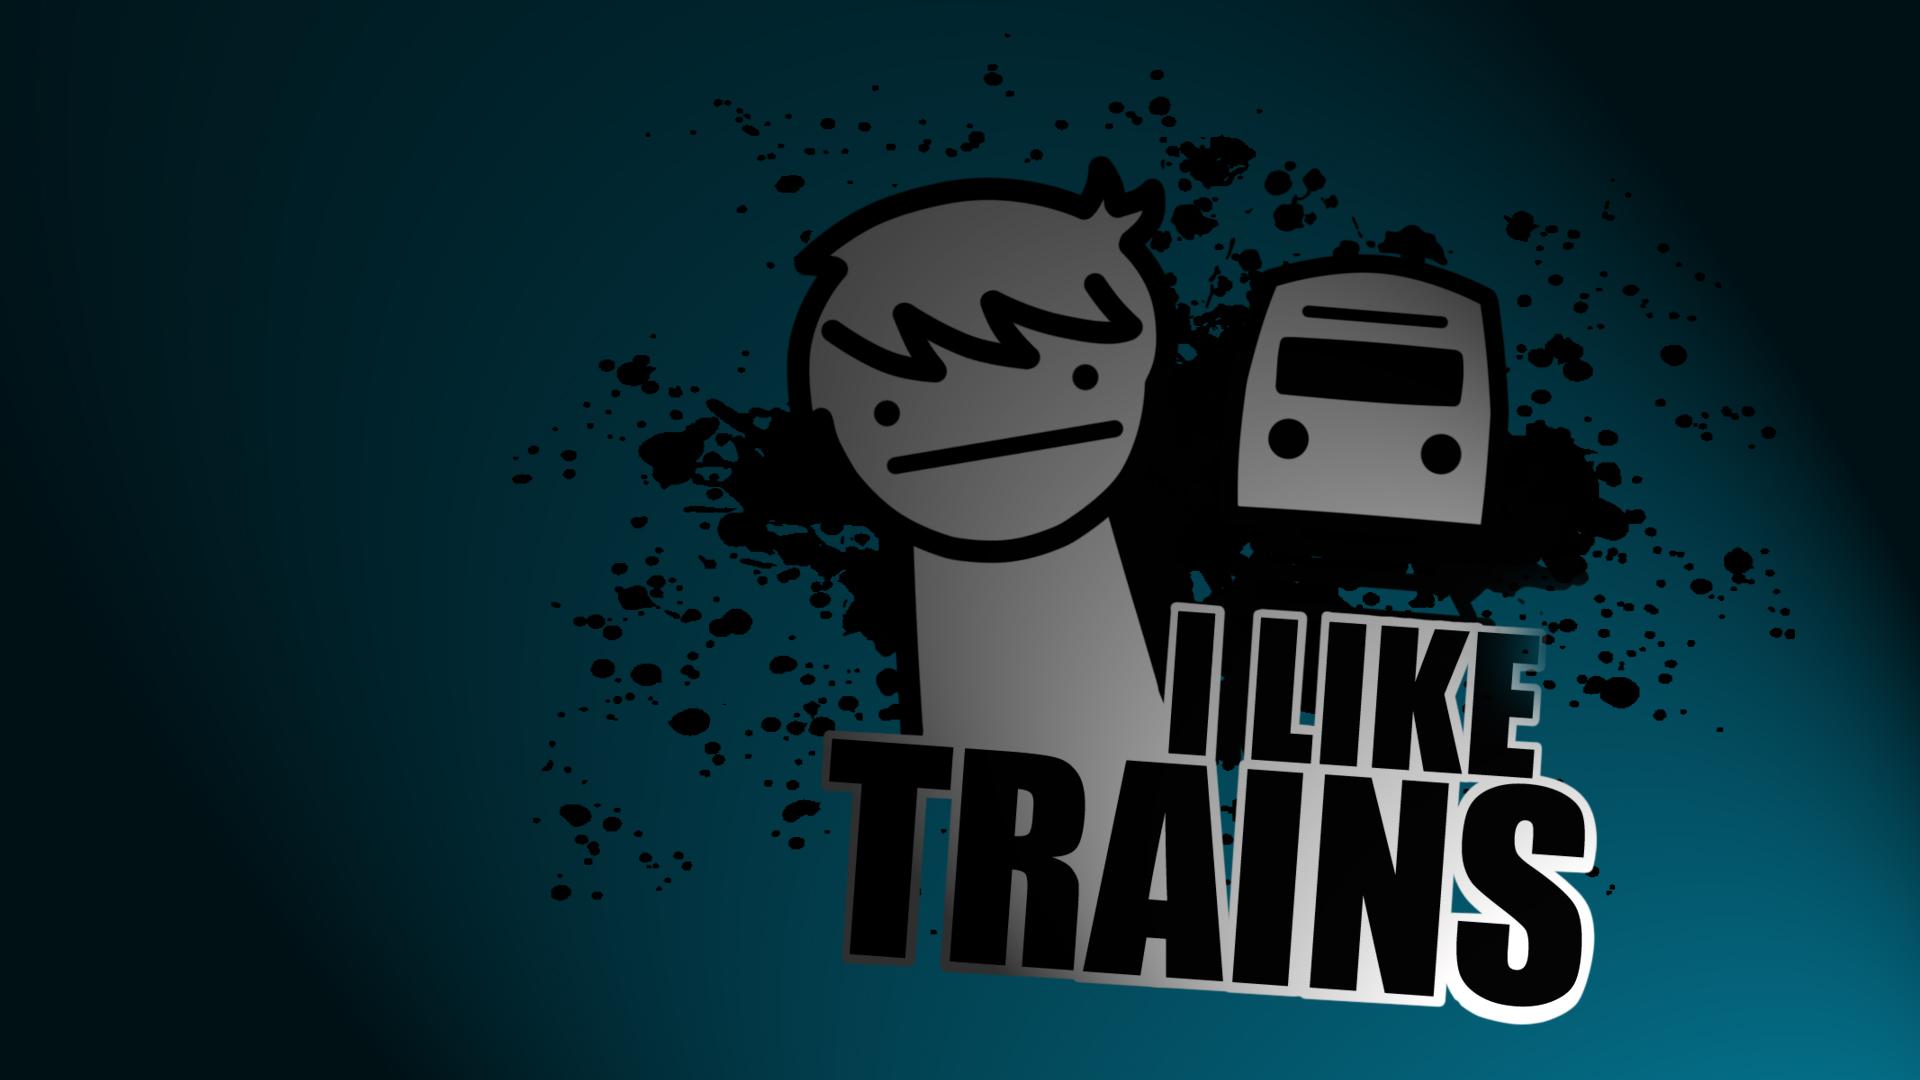 like trains by harrisonb32 - photo #1